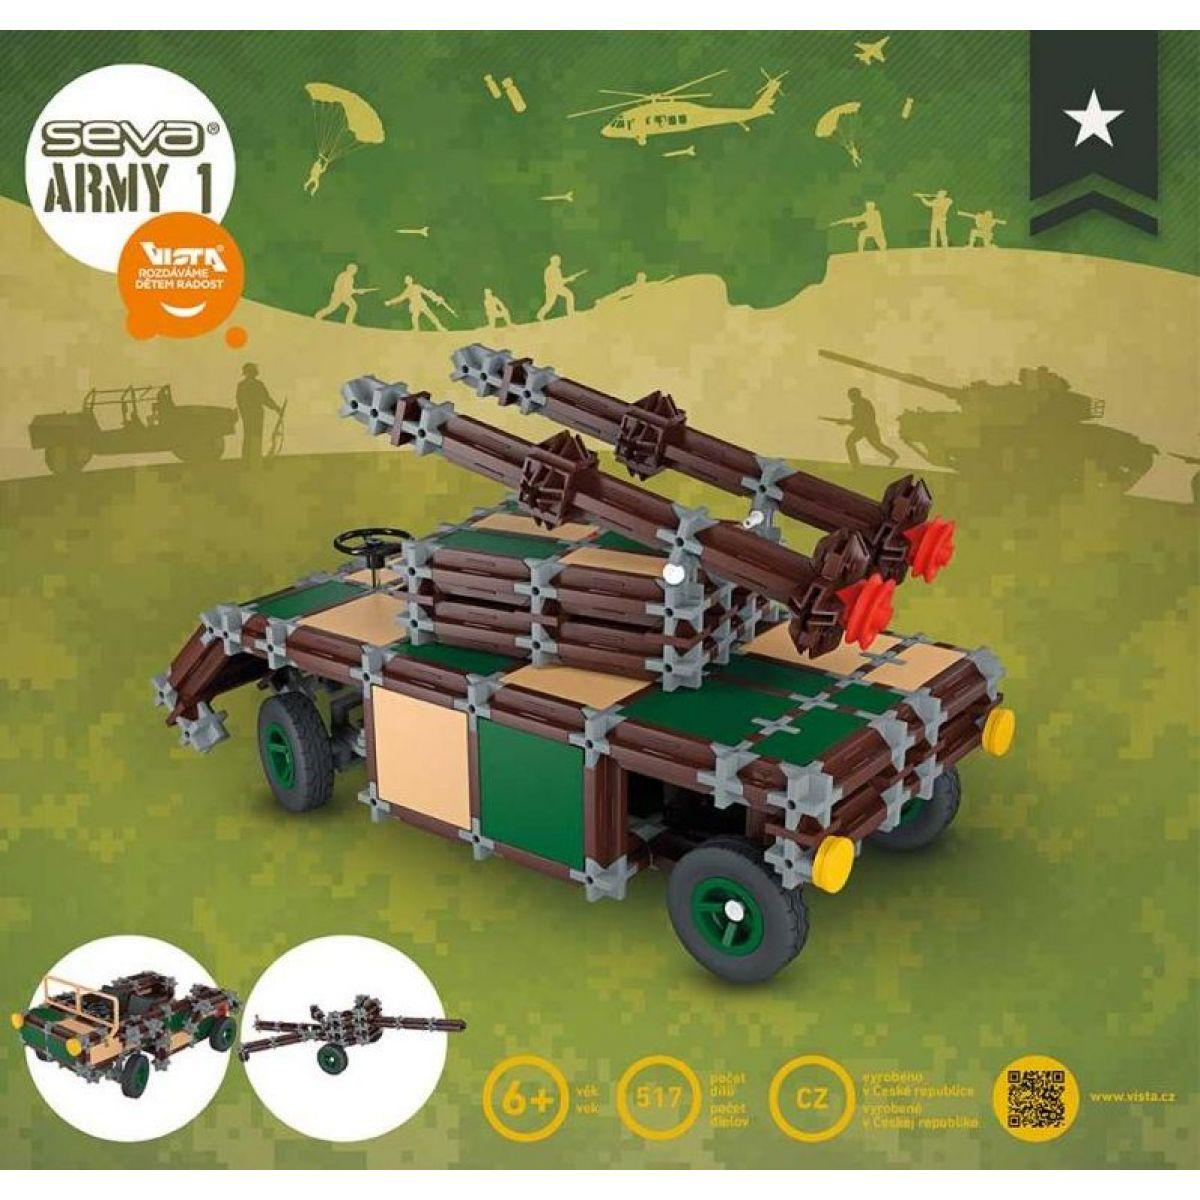 Vista Stavebnice Seva Army 1 plast 514 ks v krabici